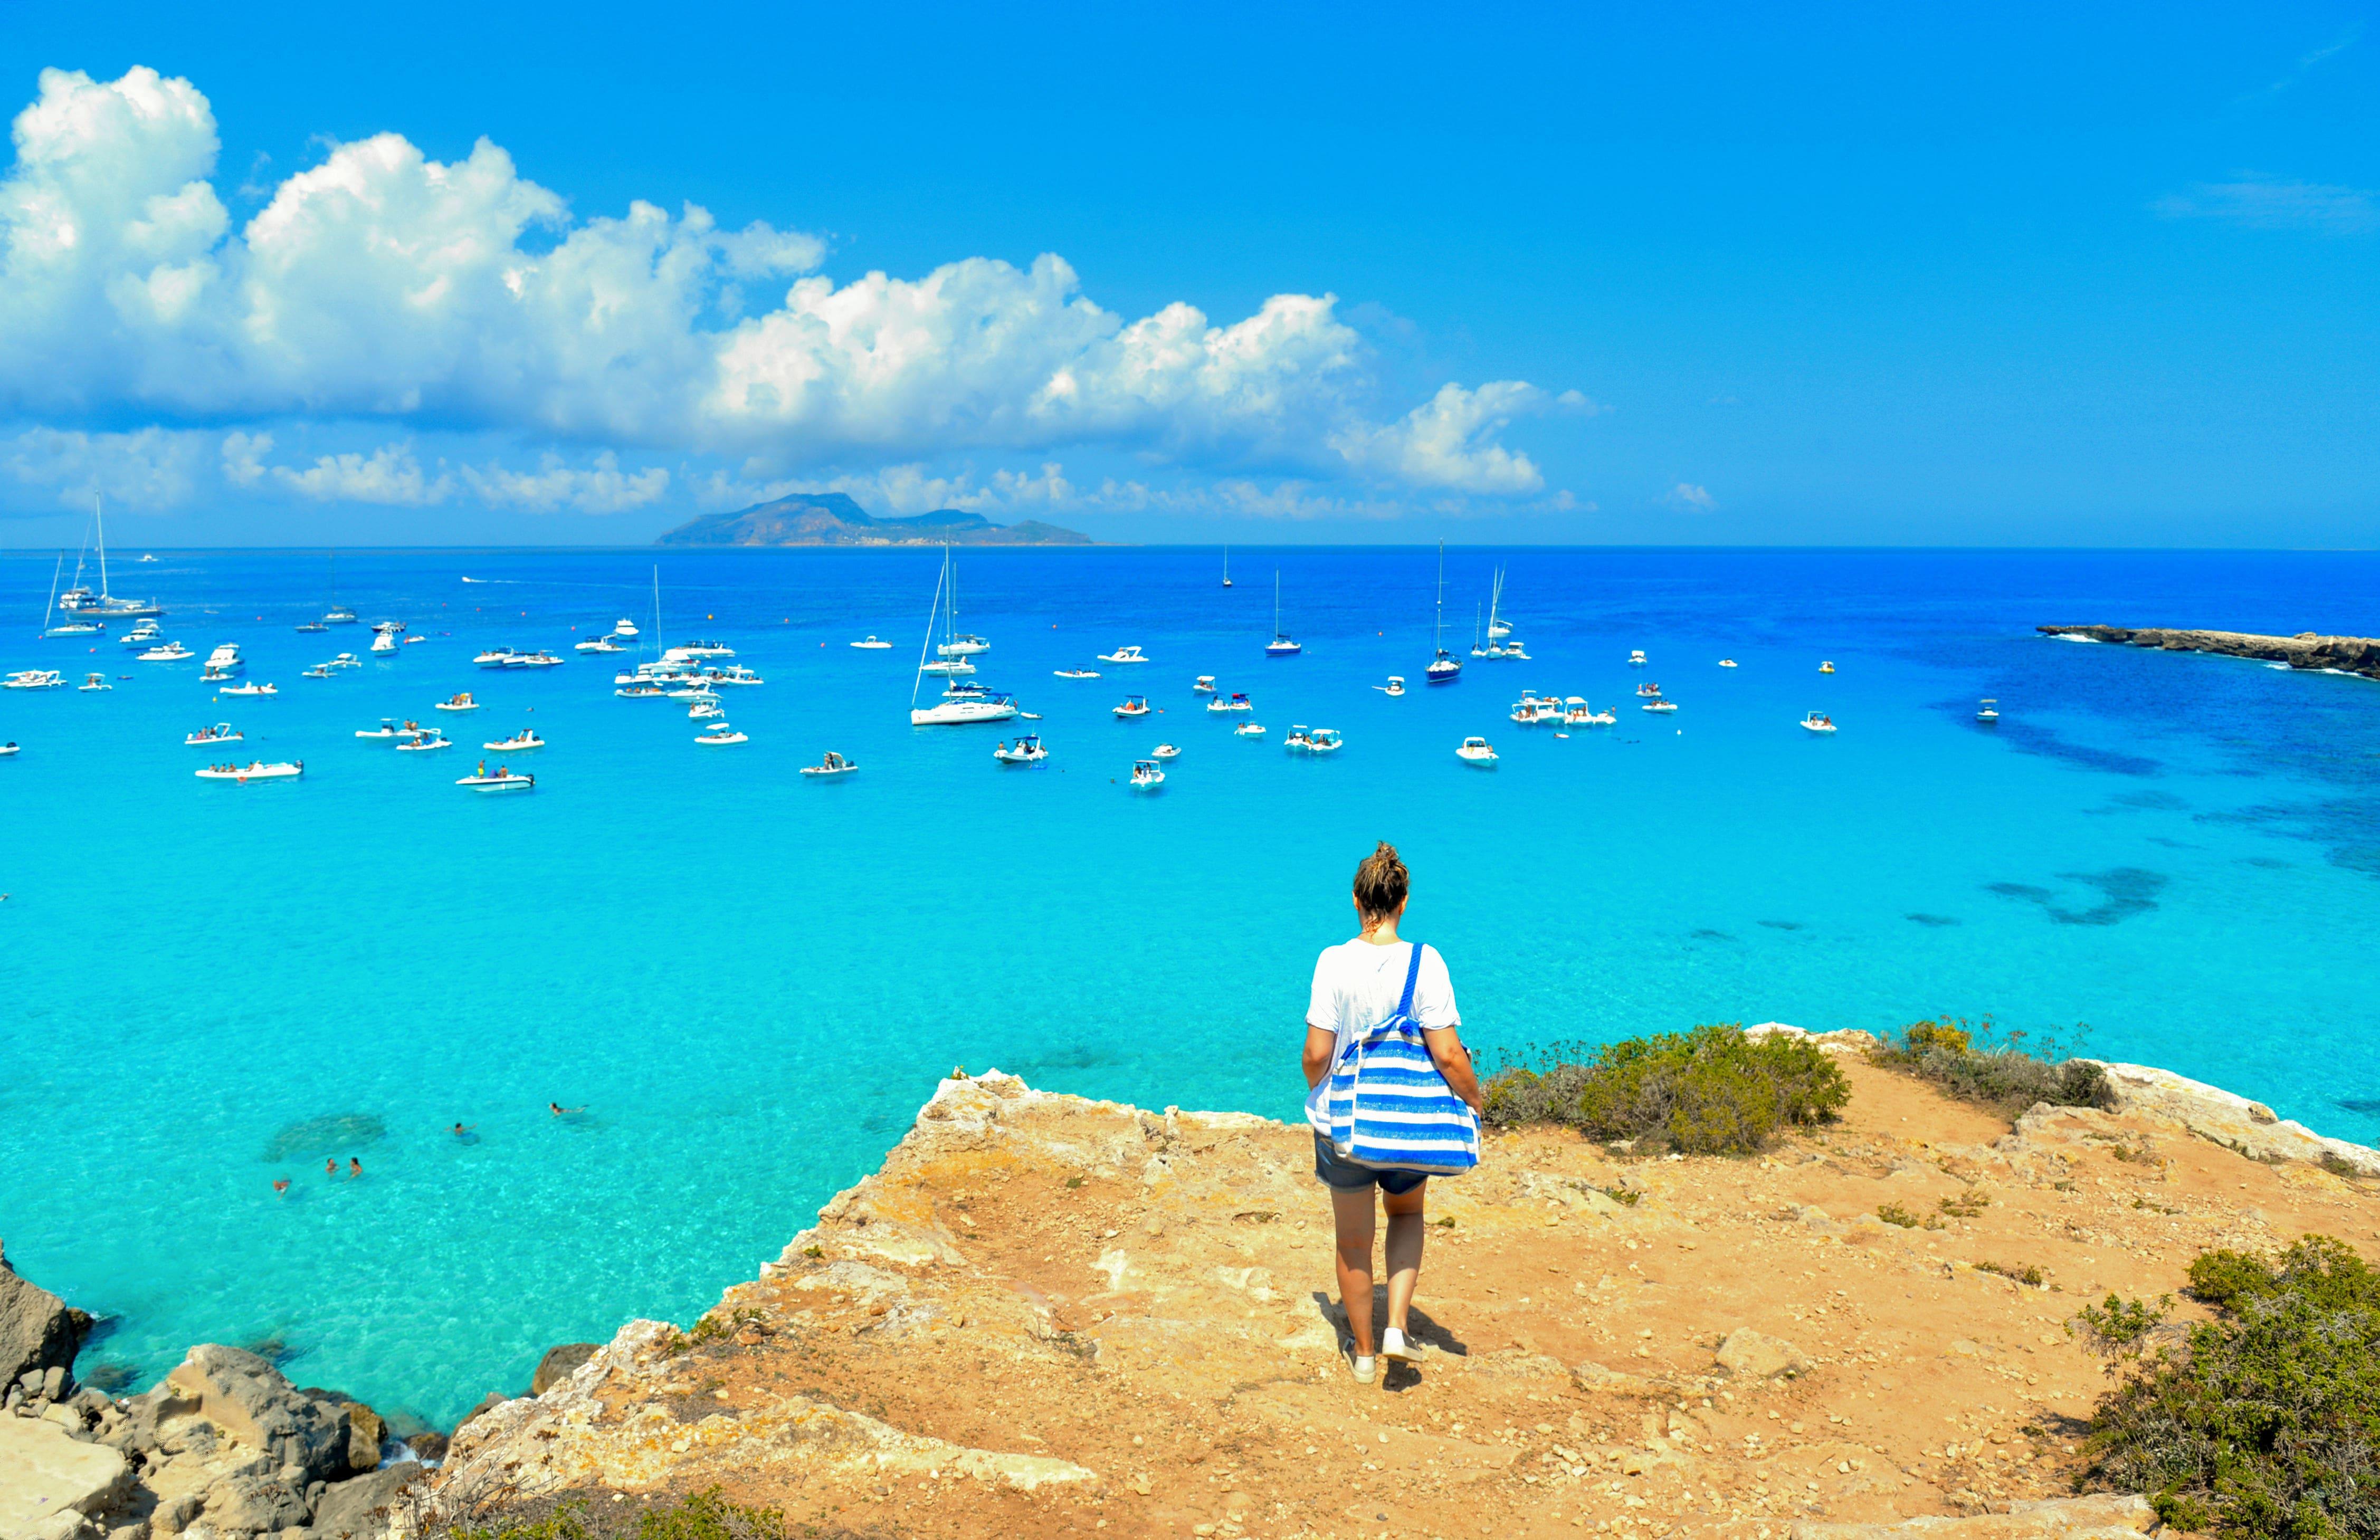 beach Cala Rossa on Favignana Island with small boats and Island Marettimo in background, Sicily Italy